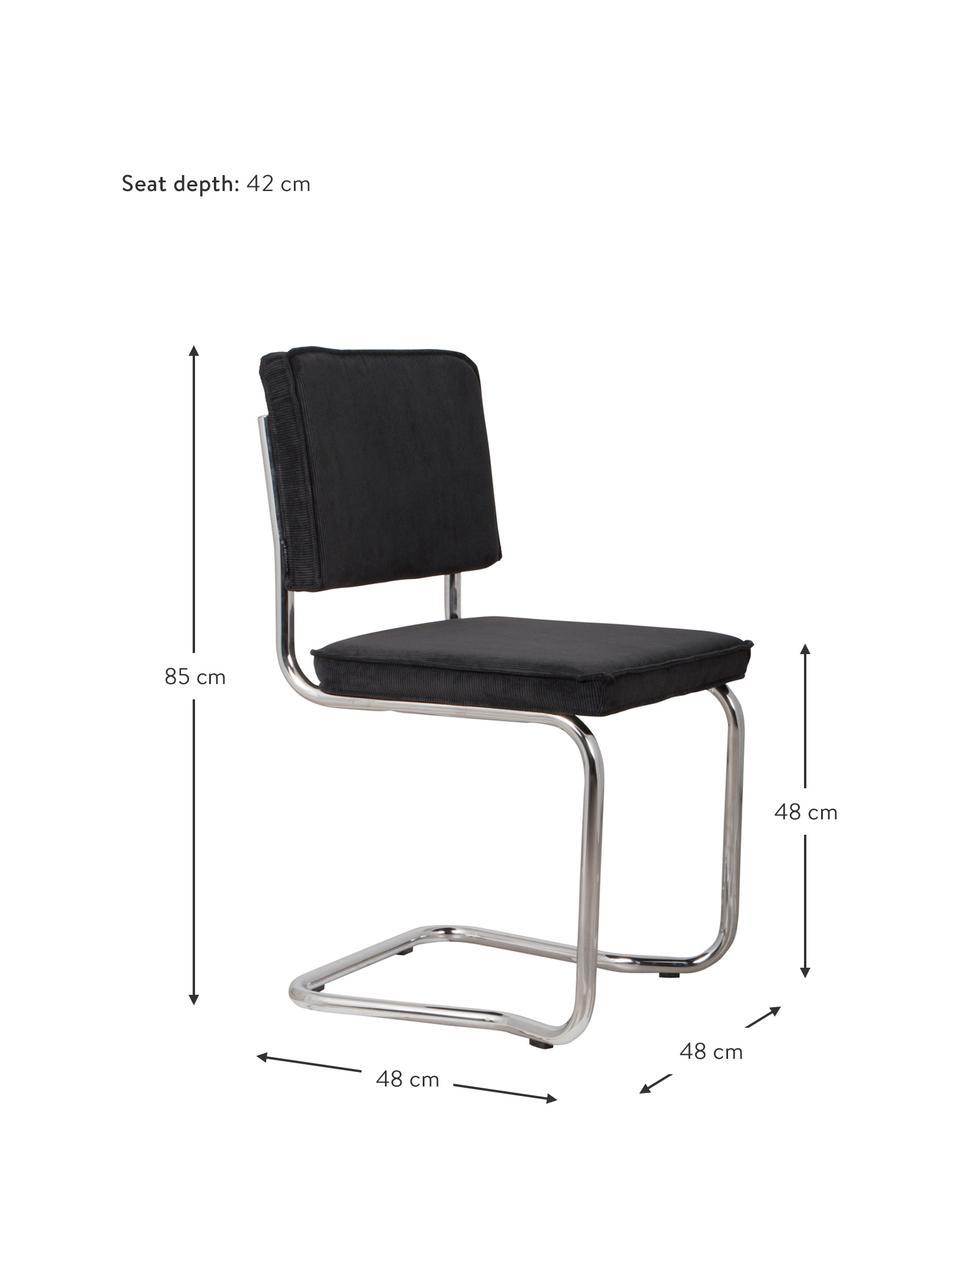 Kordsamt-Freischwinger Kink, Bezug: Kordsamt (88% Nylon, 12% , Rahmen: Metall, verchromt, Bezug: Schwarz Gestell: Chrom, B 48 x T 48 cm